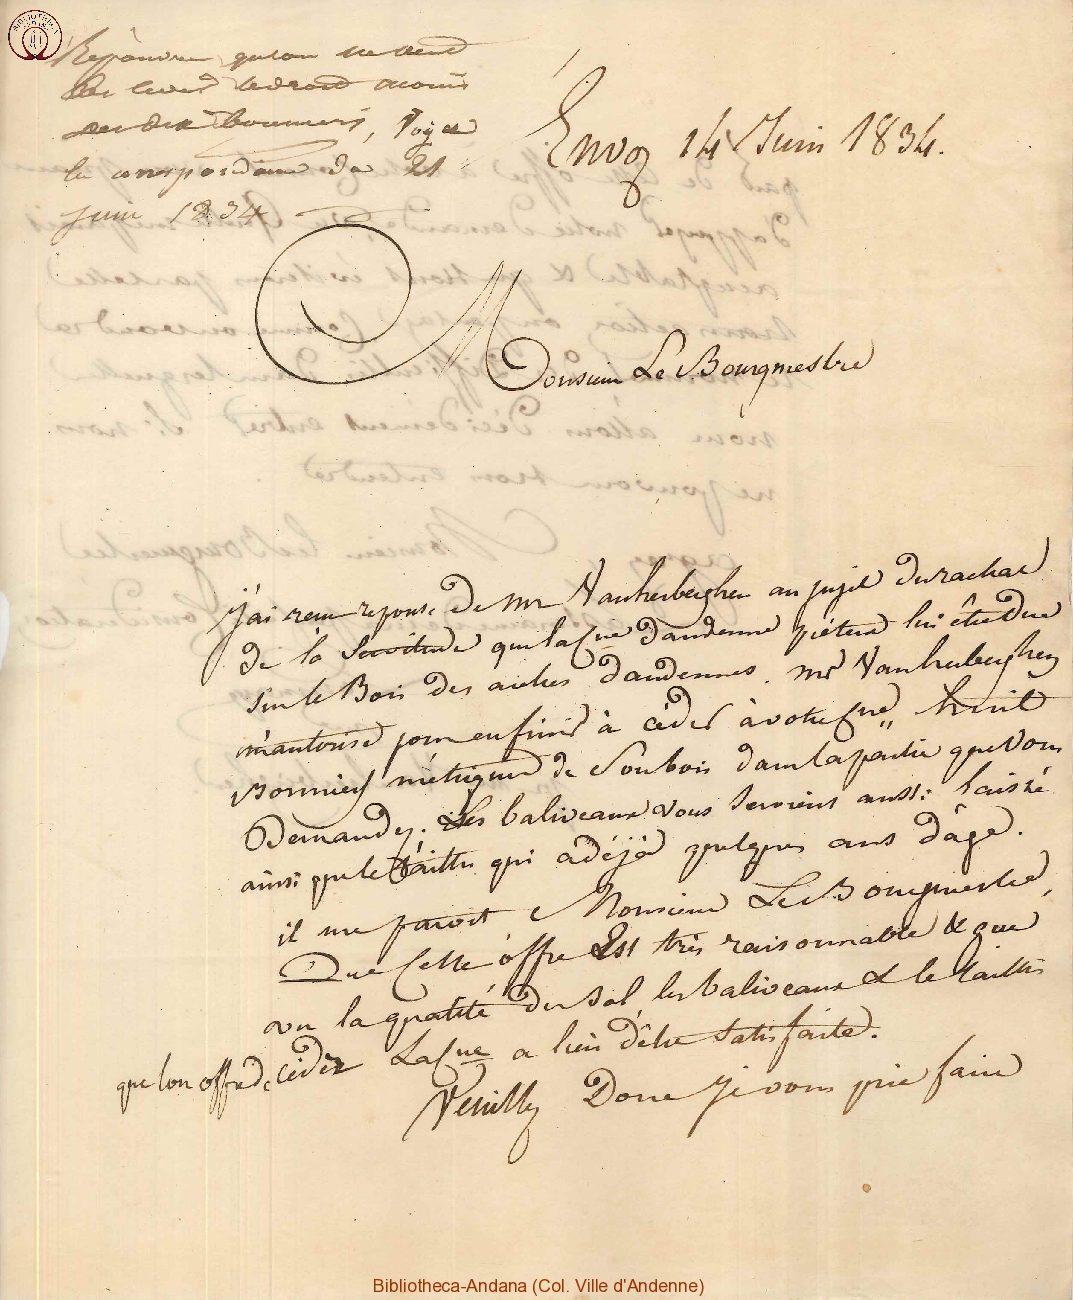 1834-06-14